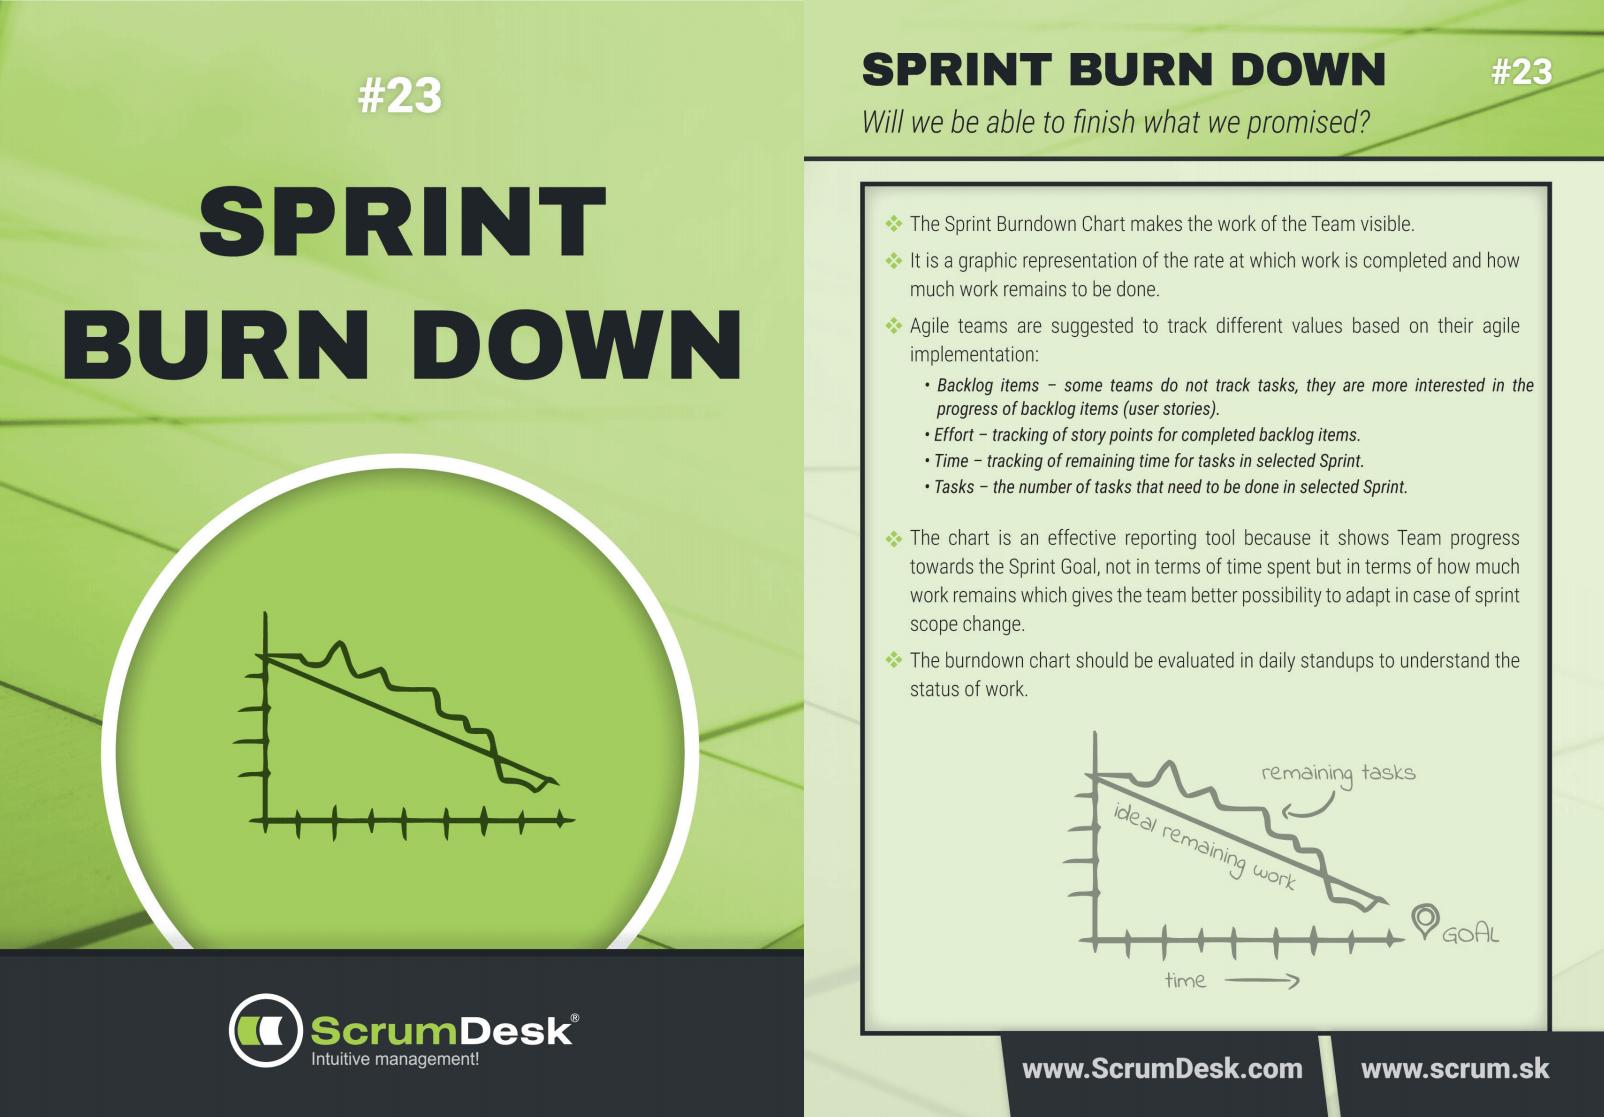 Scrum karty 23 - Sprint BurnDown